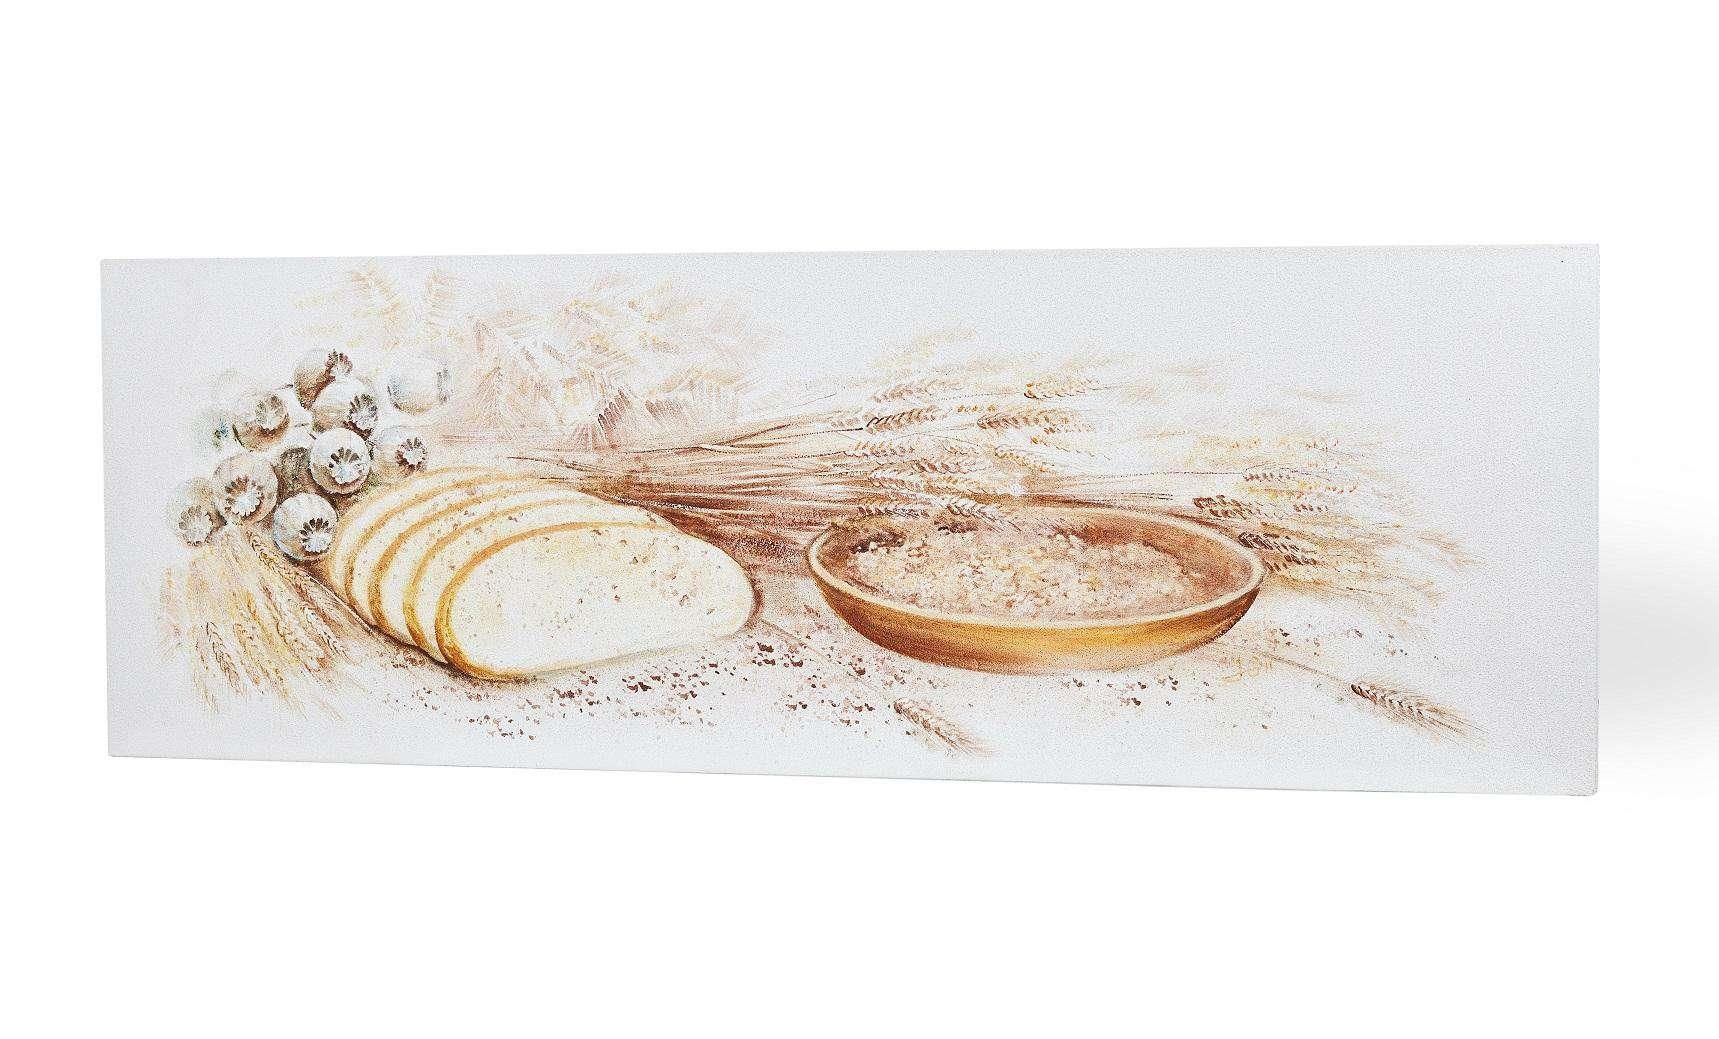 chleb 30 - Promienniki obrazy